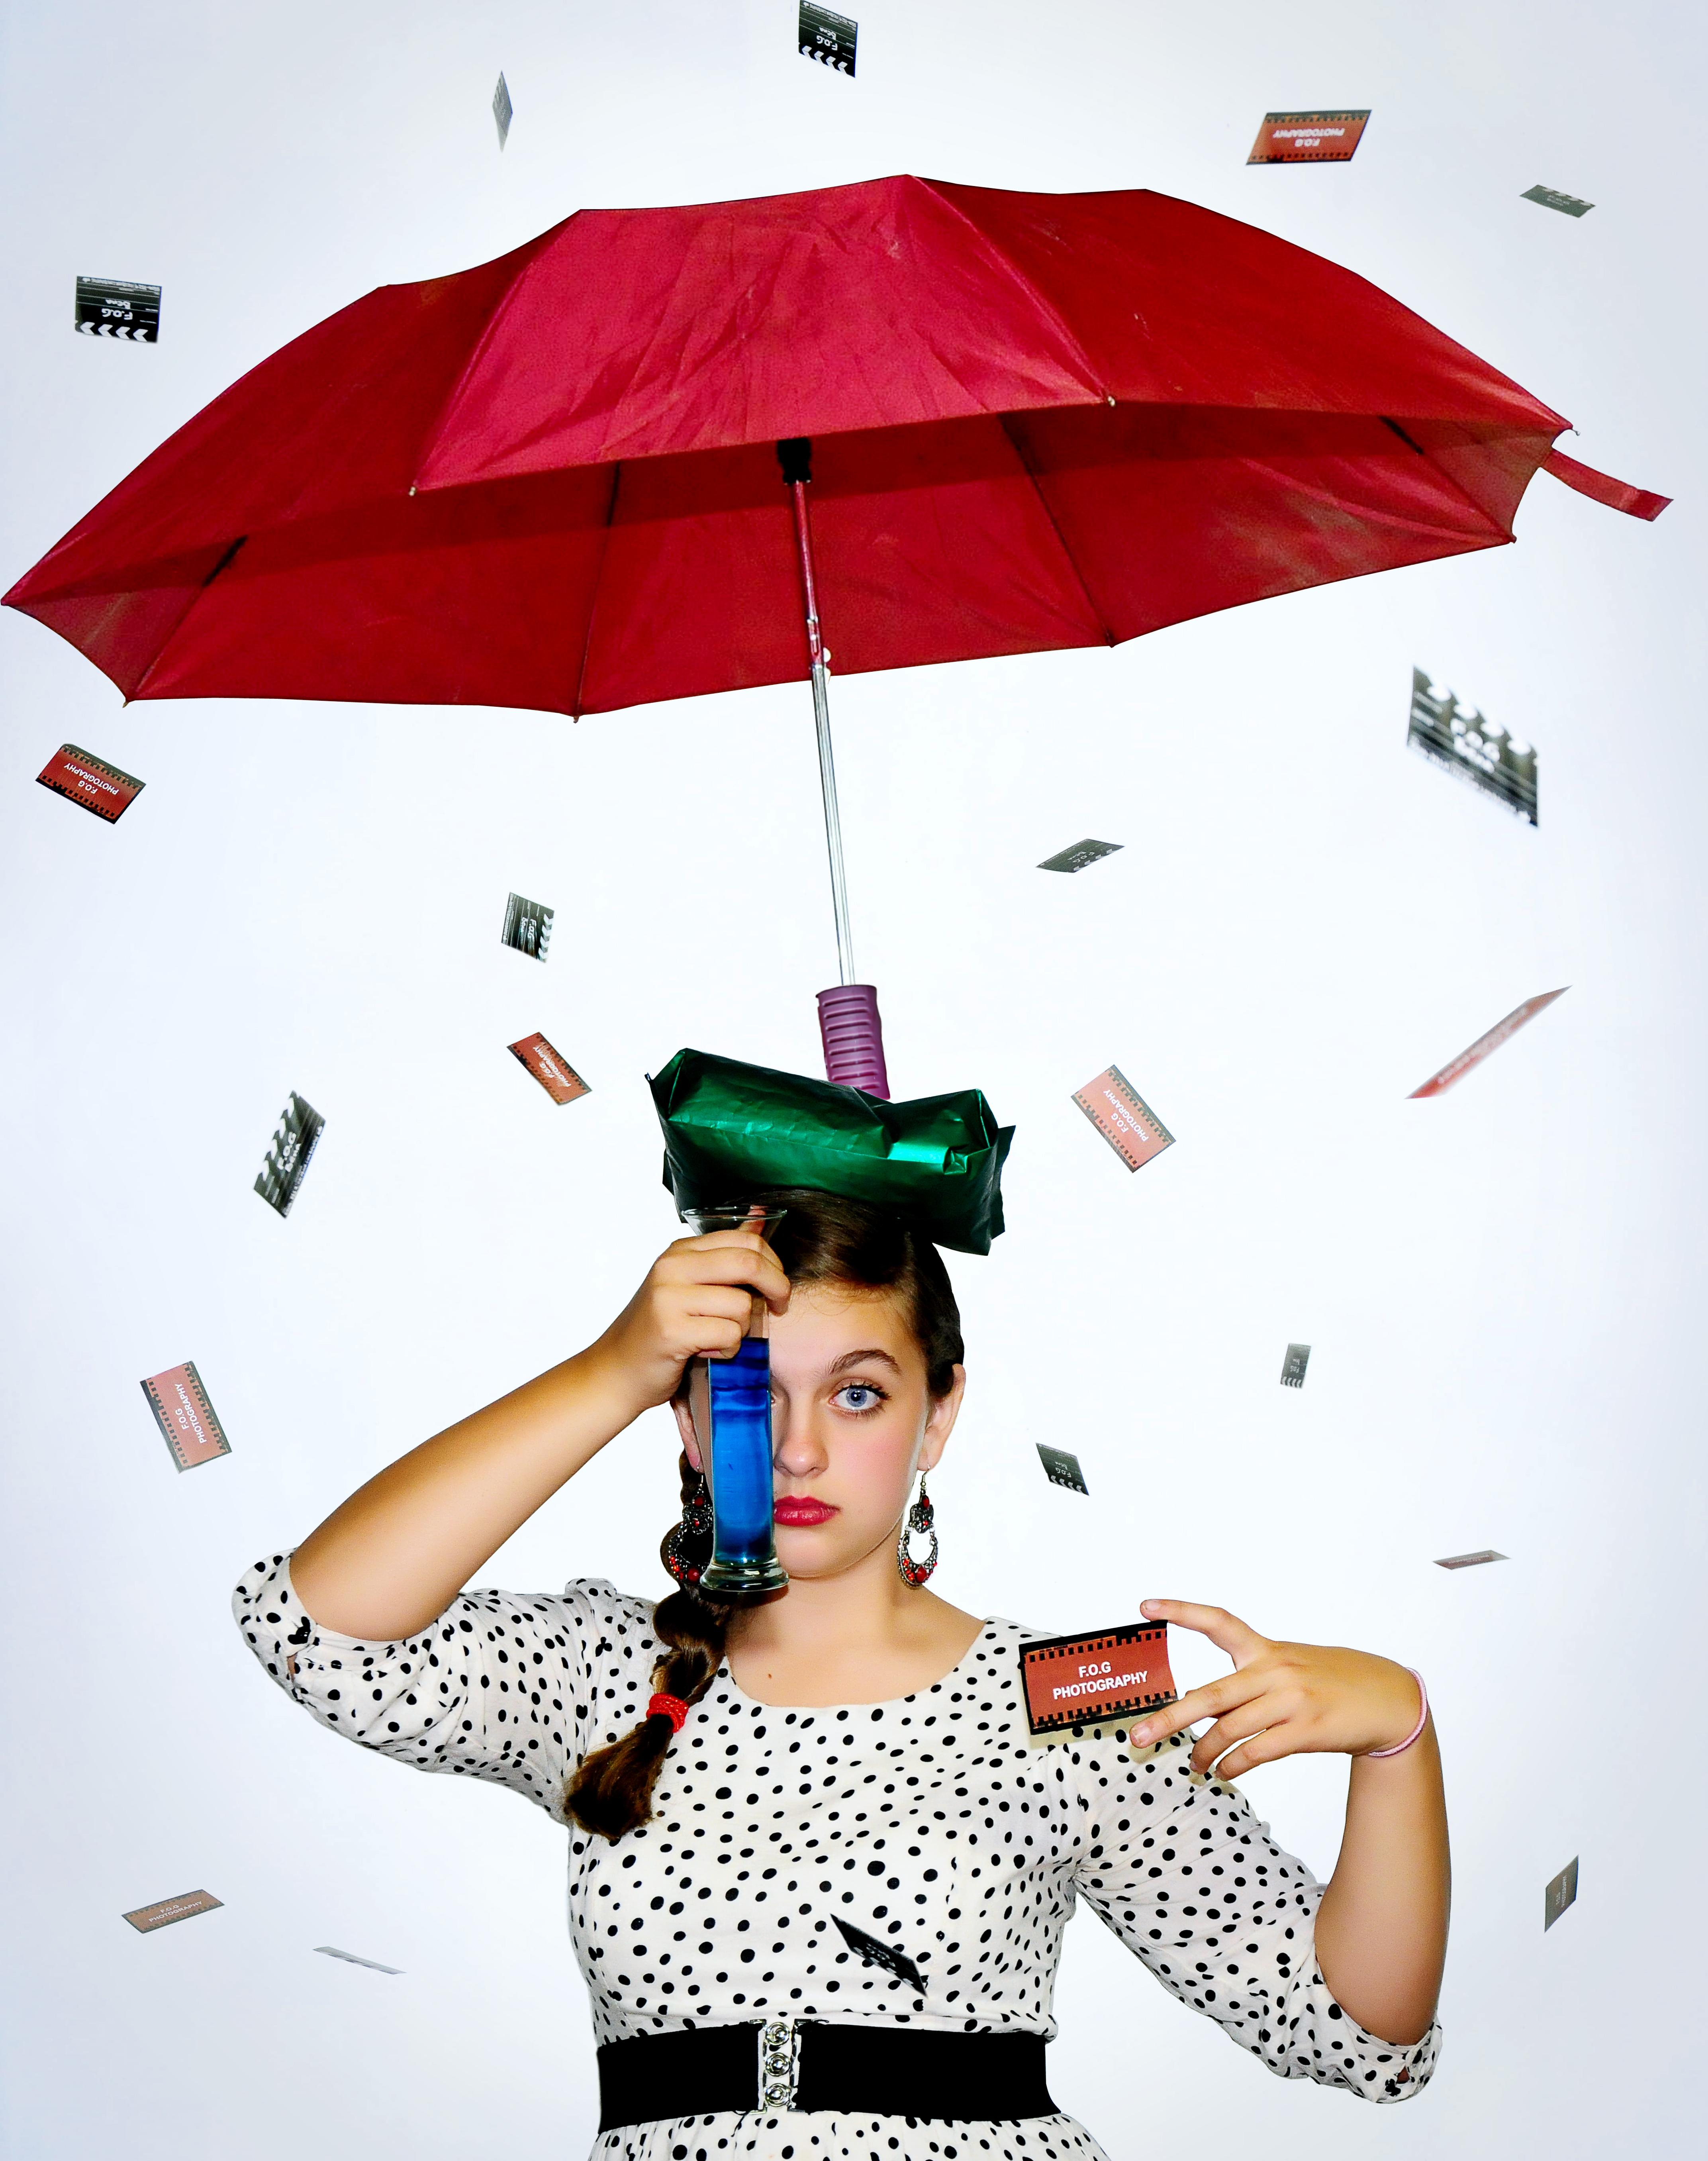 Raining F.O.G by BENAFOG